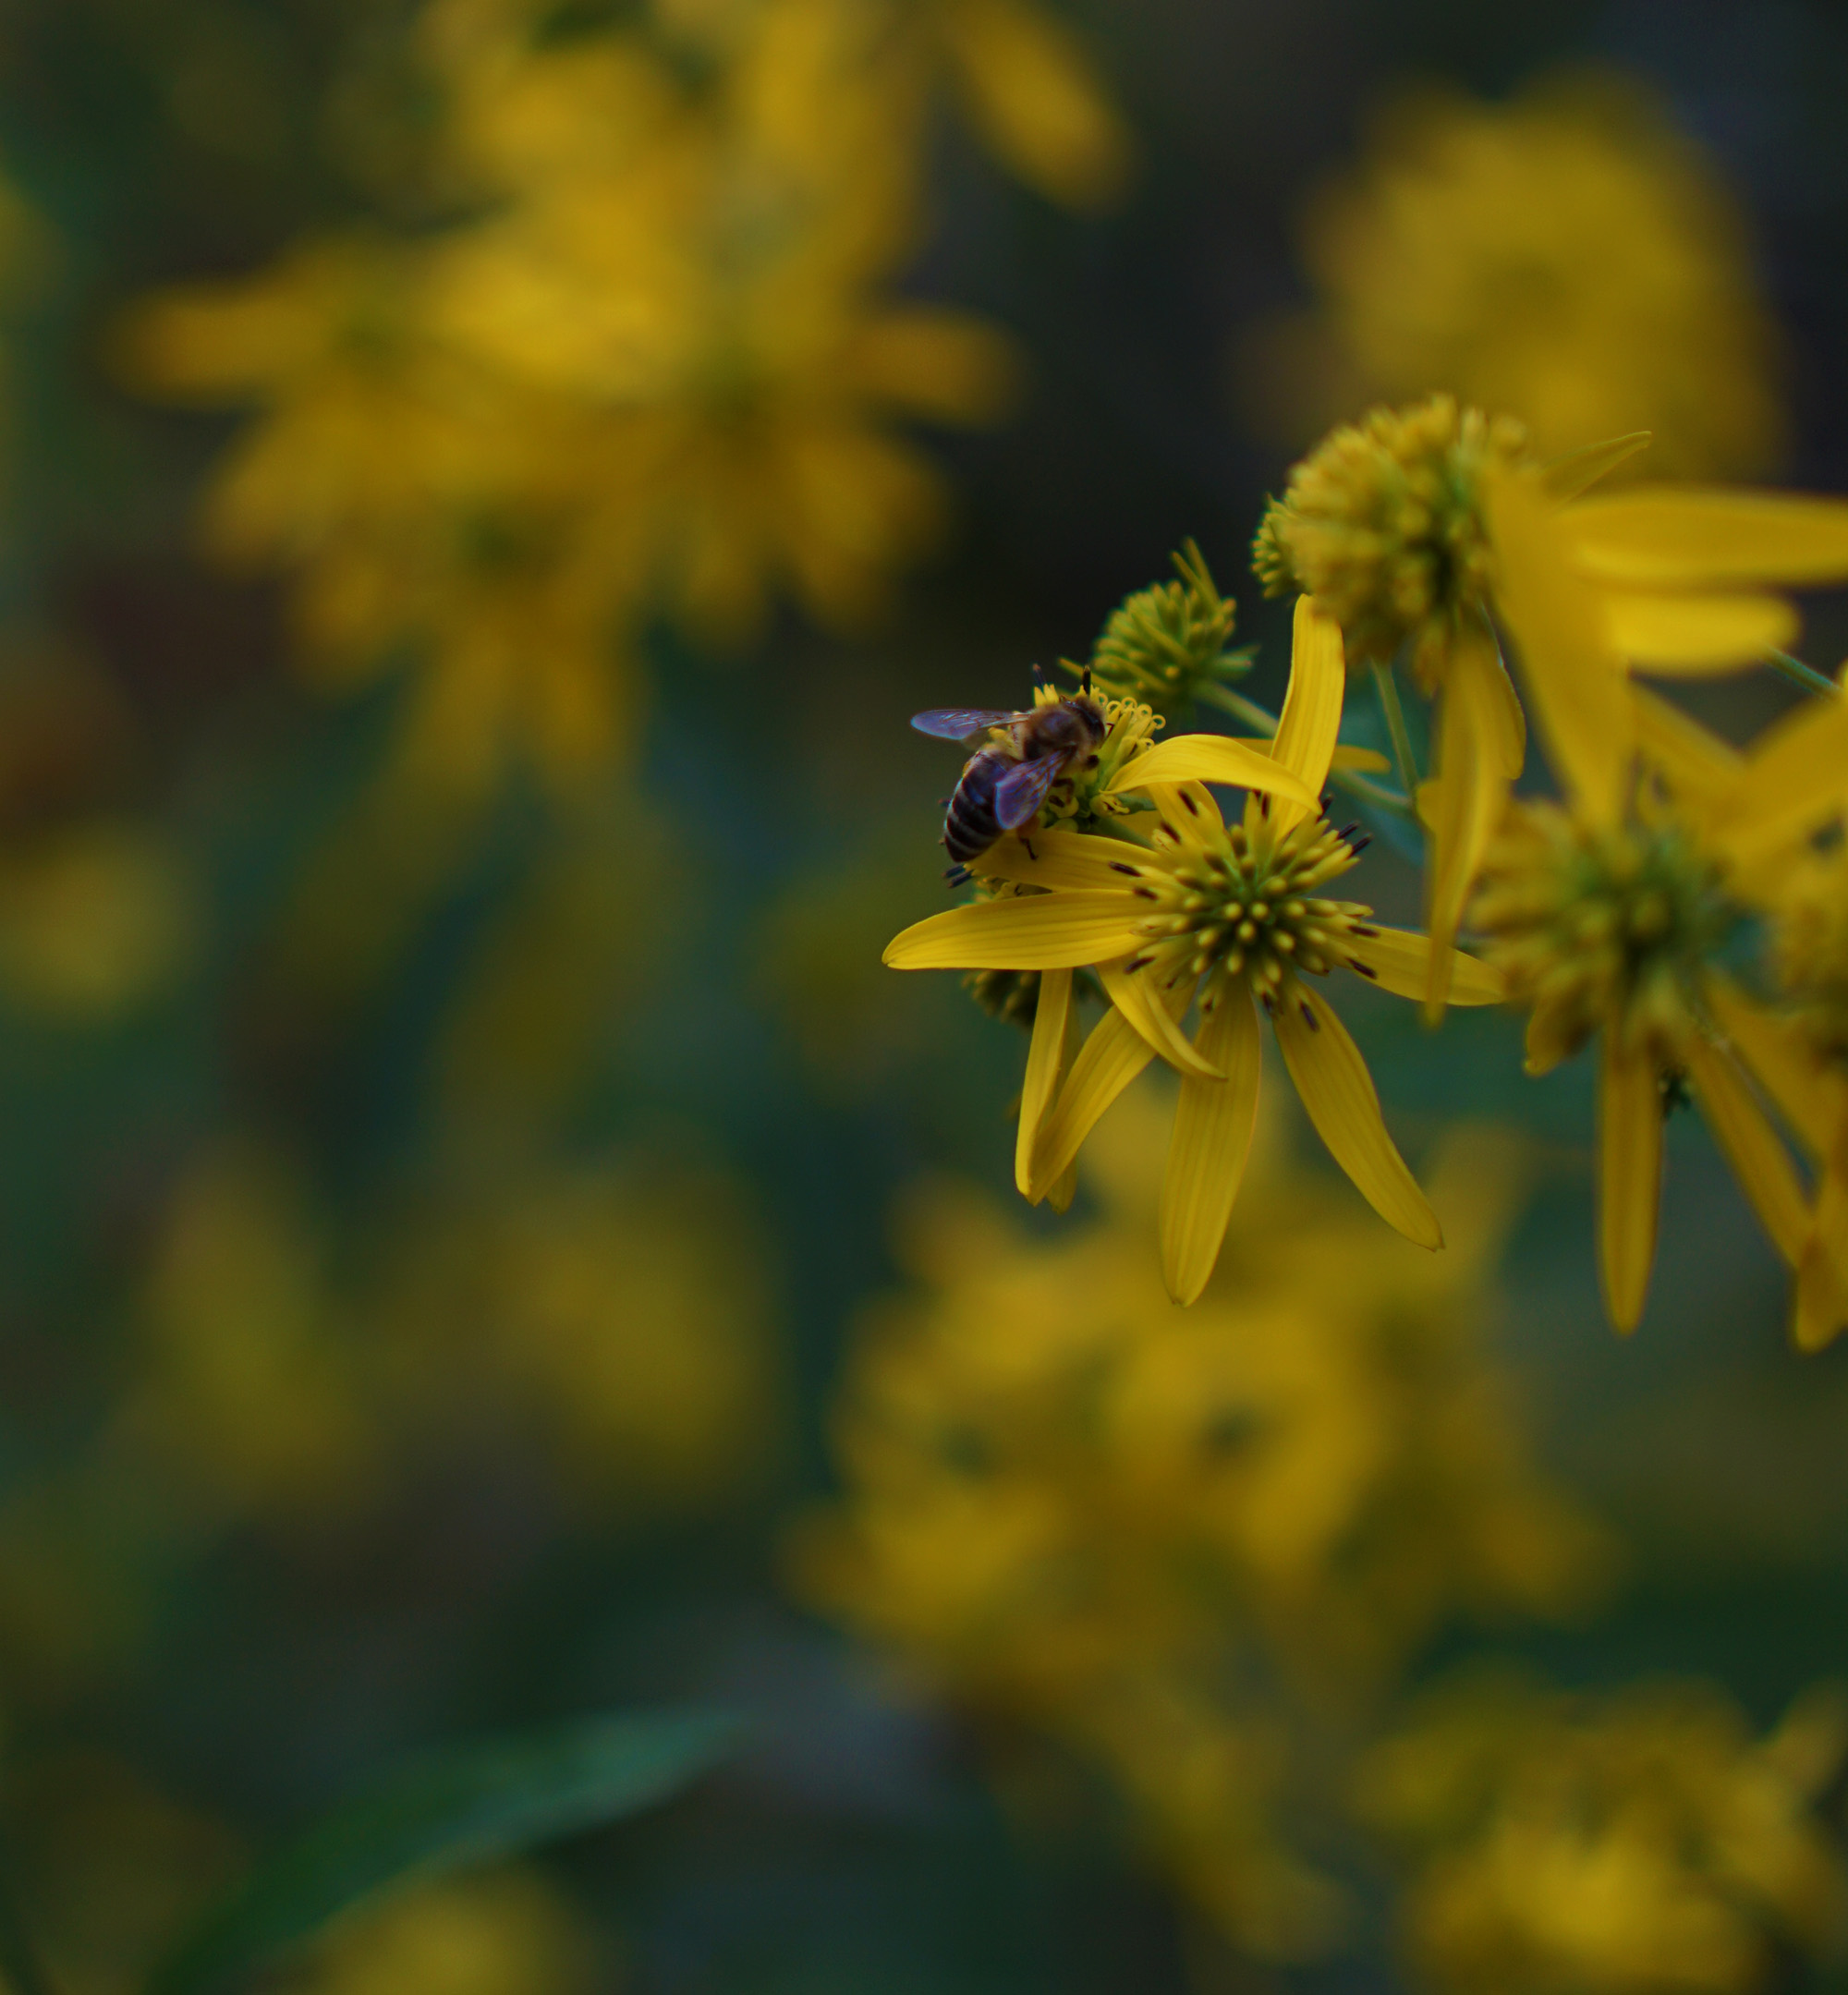 Bee on flowers, North Park Village Nature Center / Darker than Green